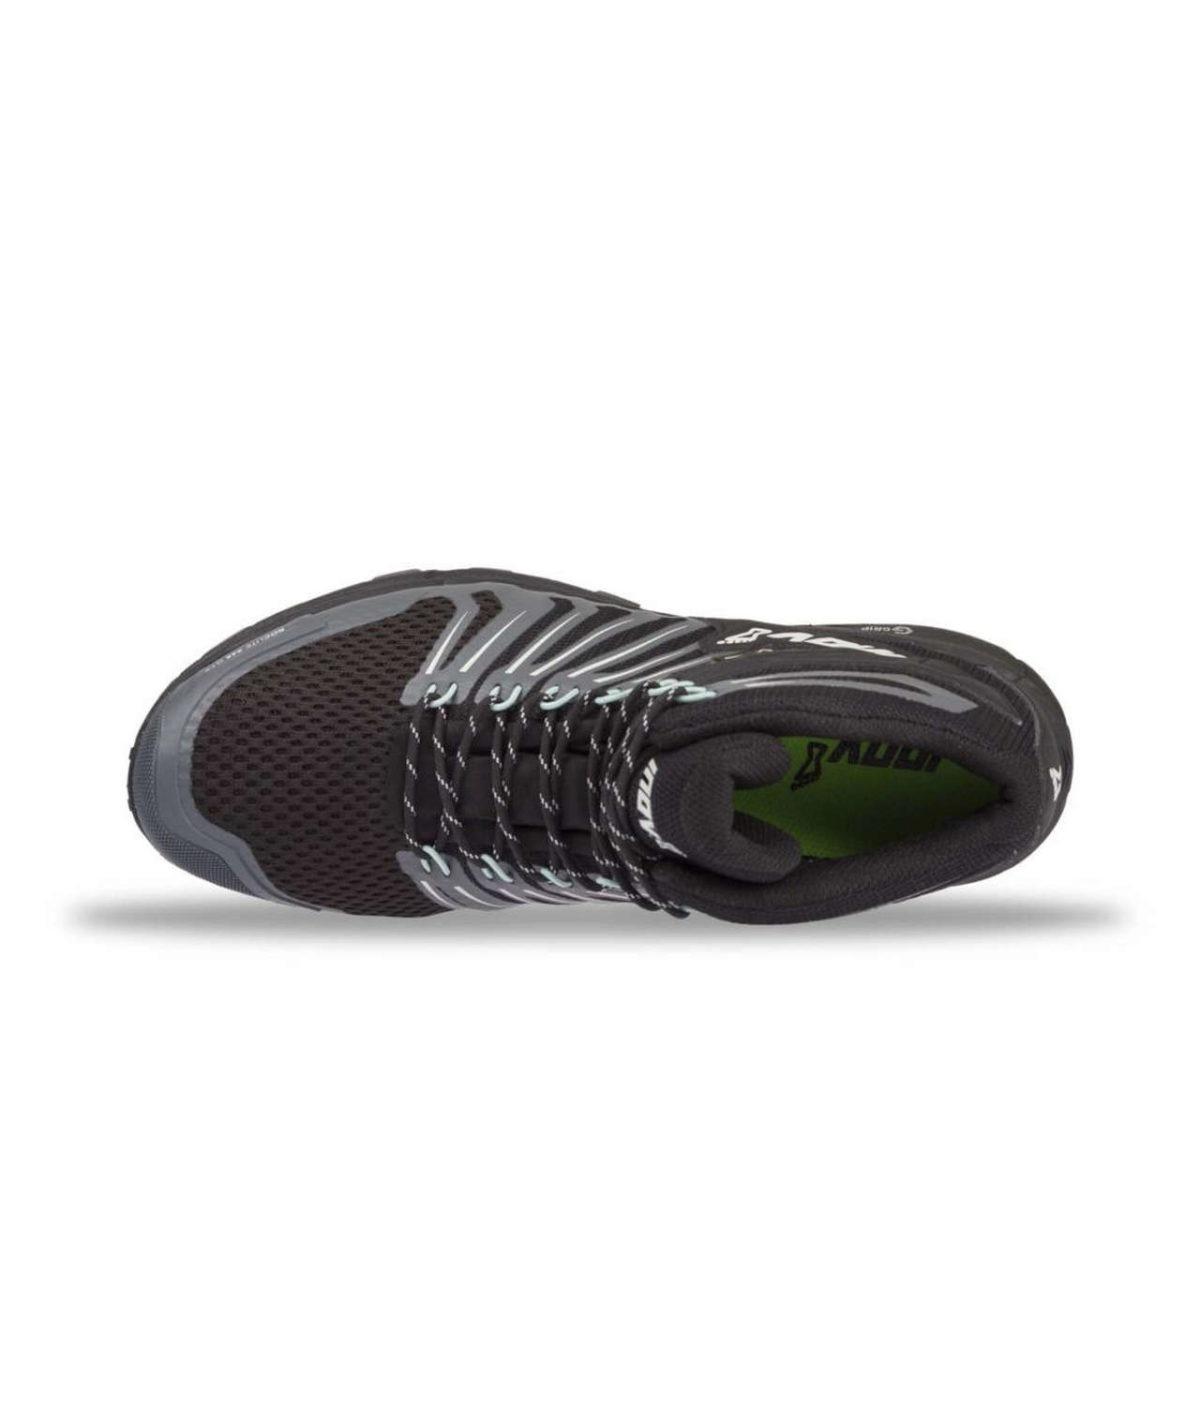 inov 8 roclite 345 gtx womens black green Fast and Light 4 1